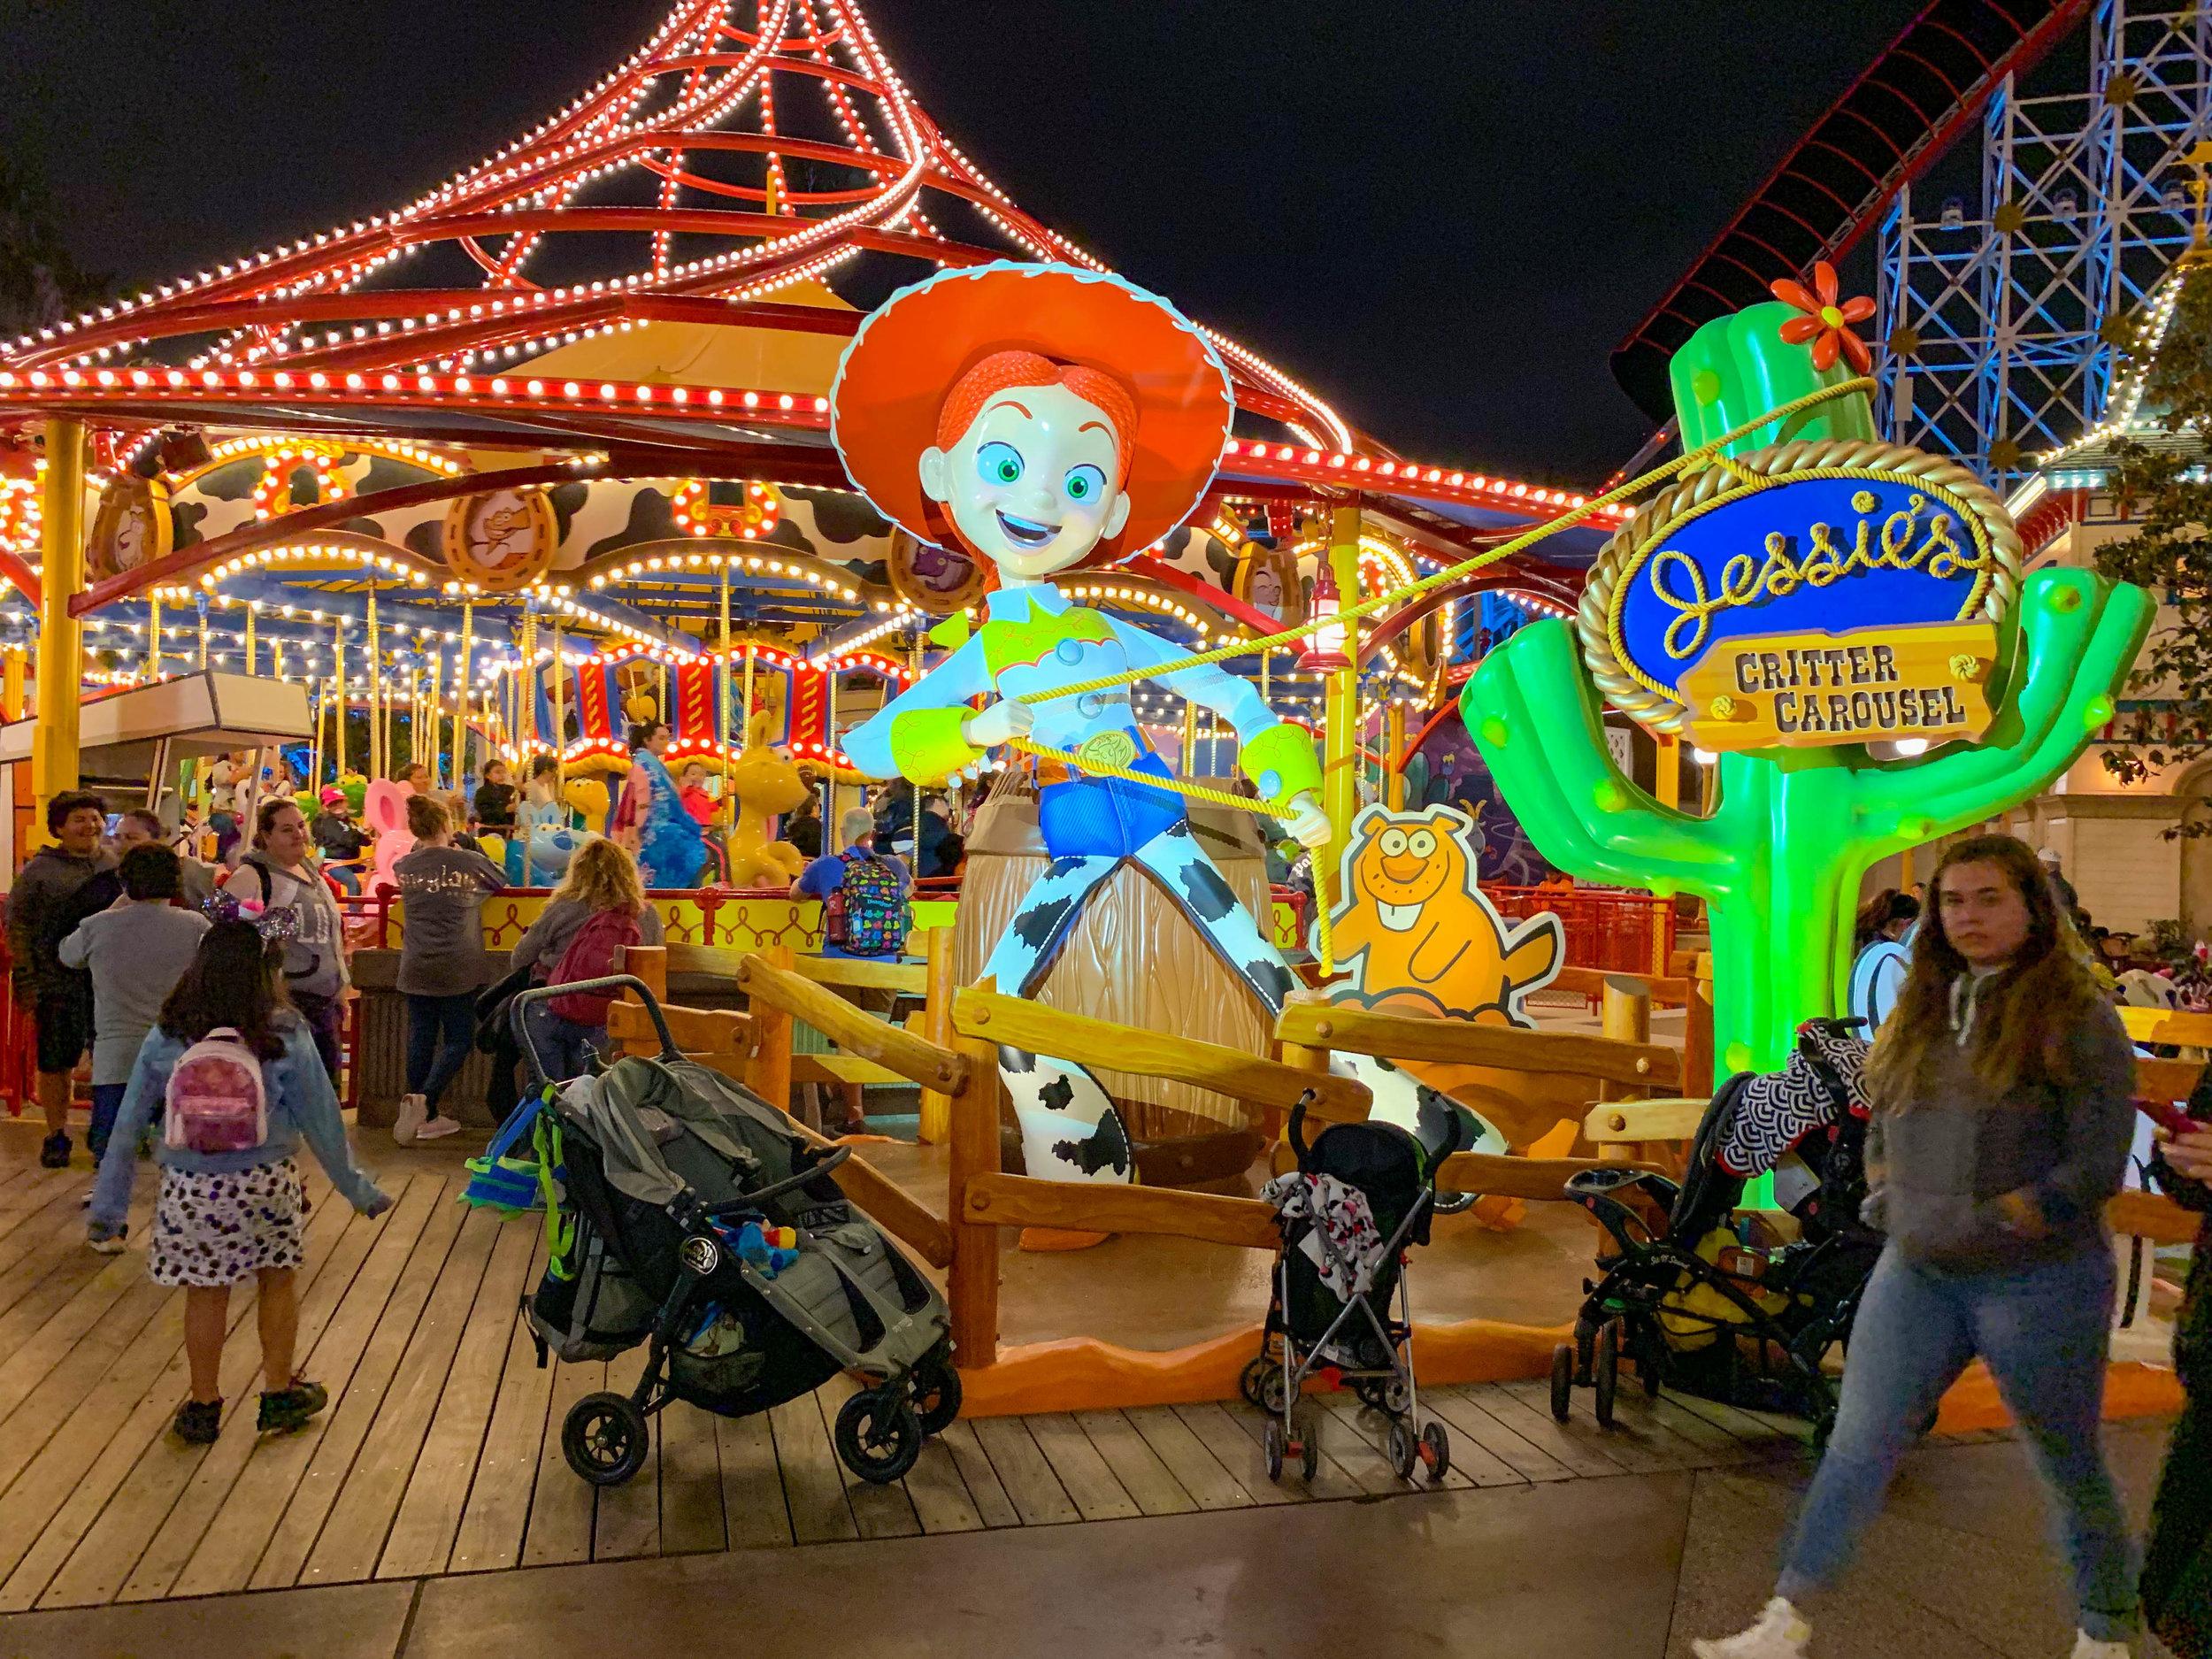 Disneyland_2019-Jessies_Critter_carousel_Open.jpg